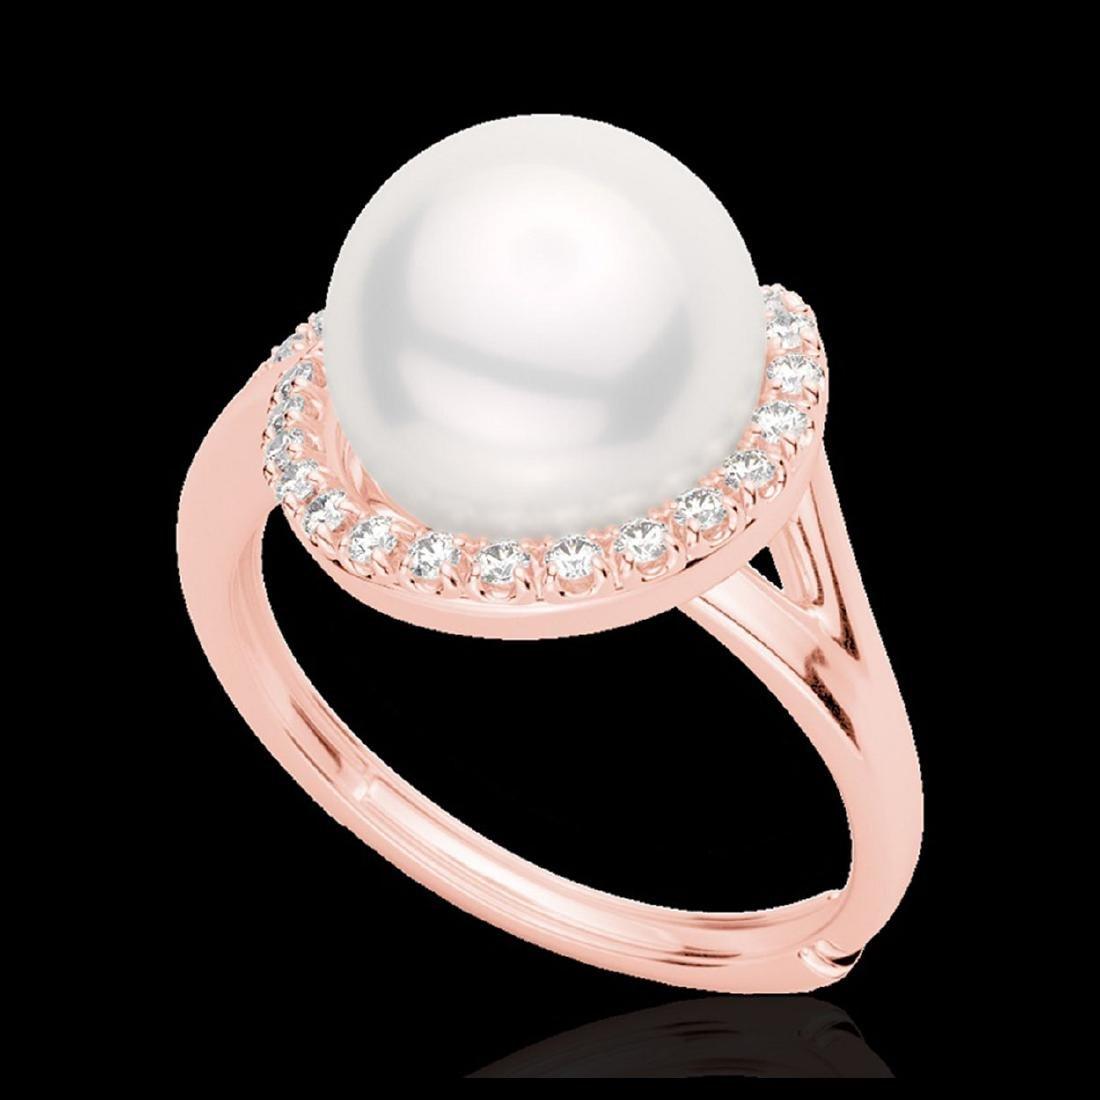 0.27 ctw VS/SI Diamond & White Pearl Ring 14K Rose Gold - 2